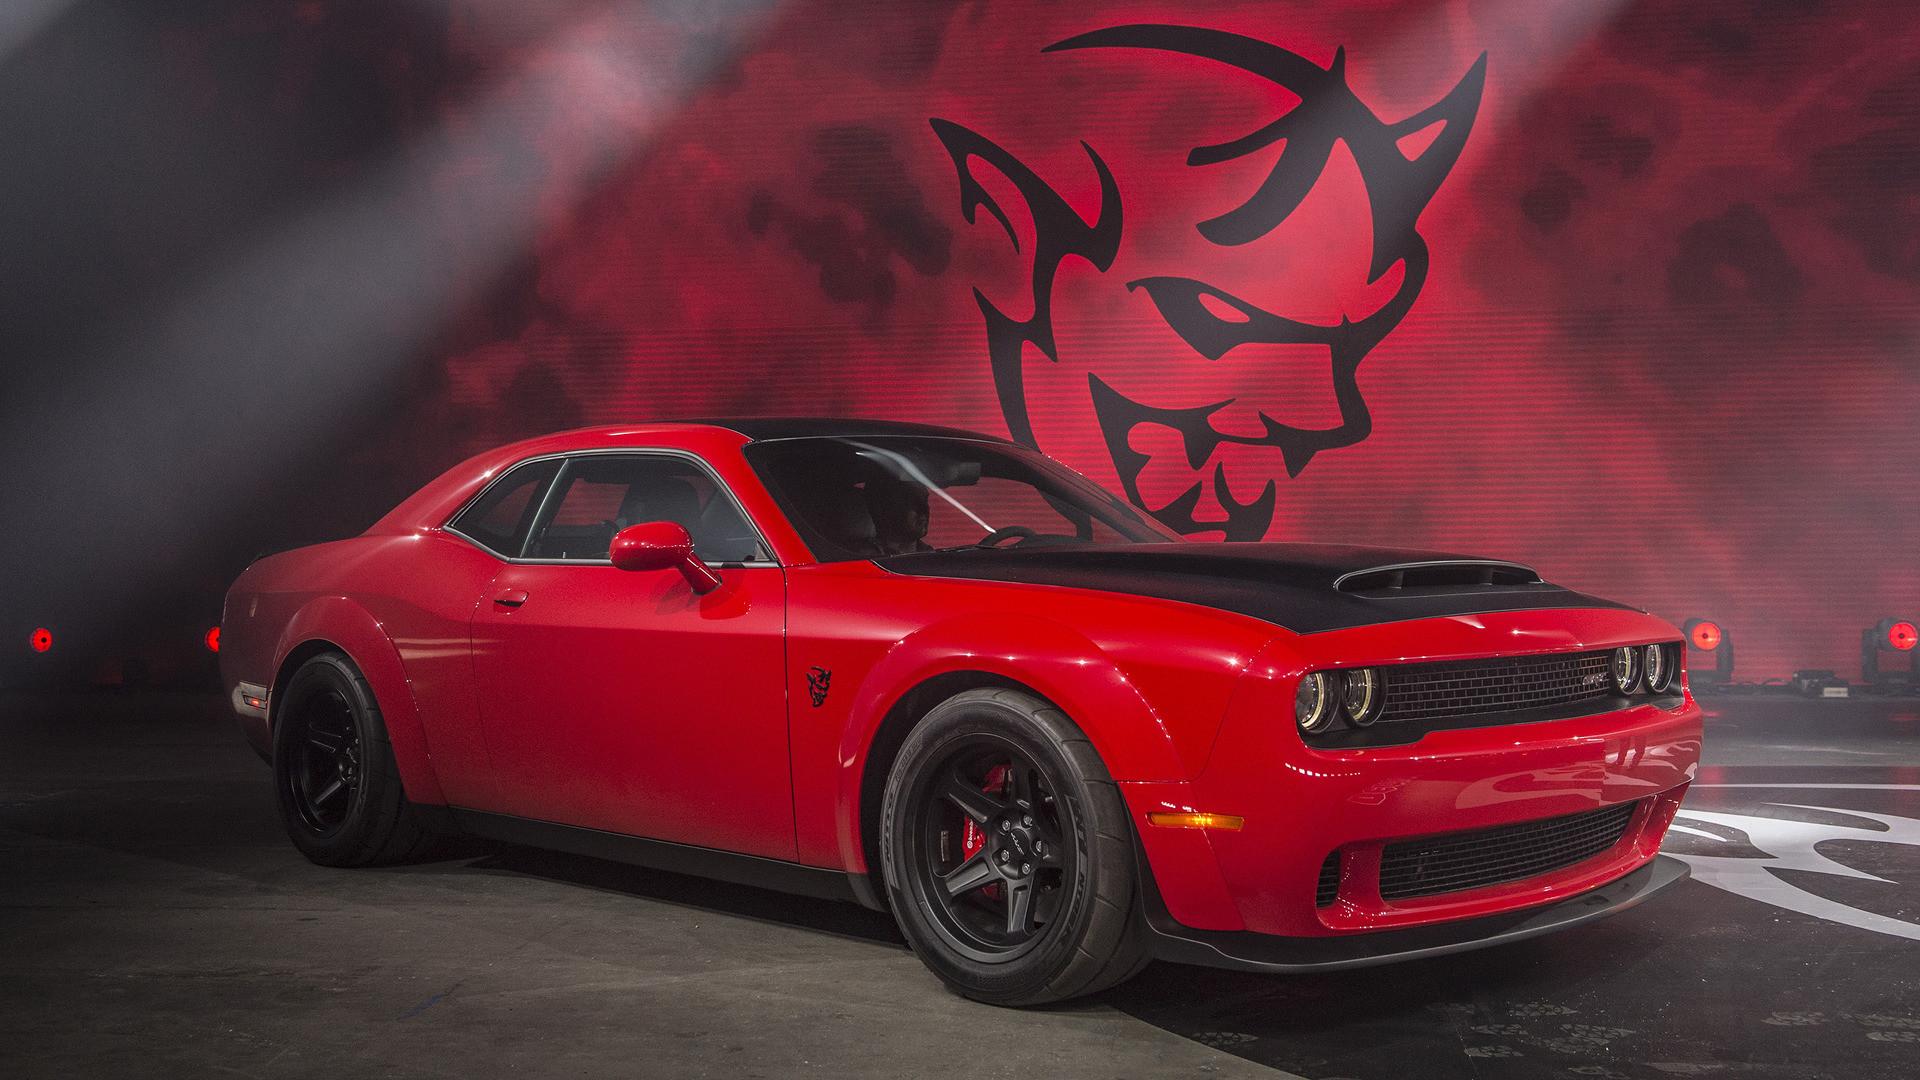 Black Dodge Demon Wallpaper